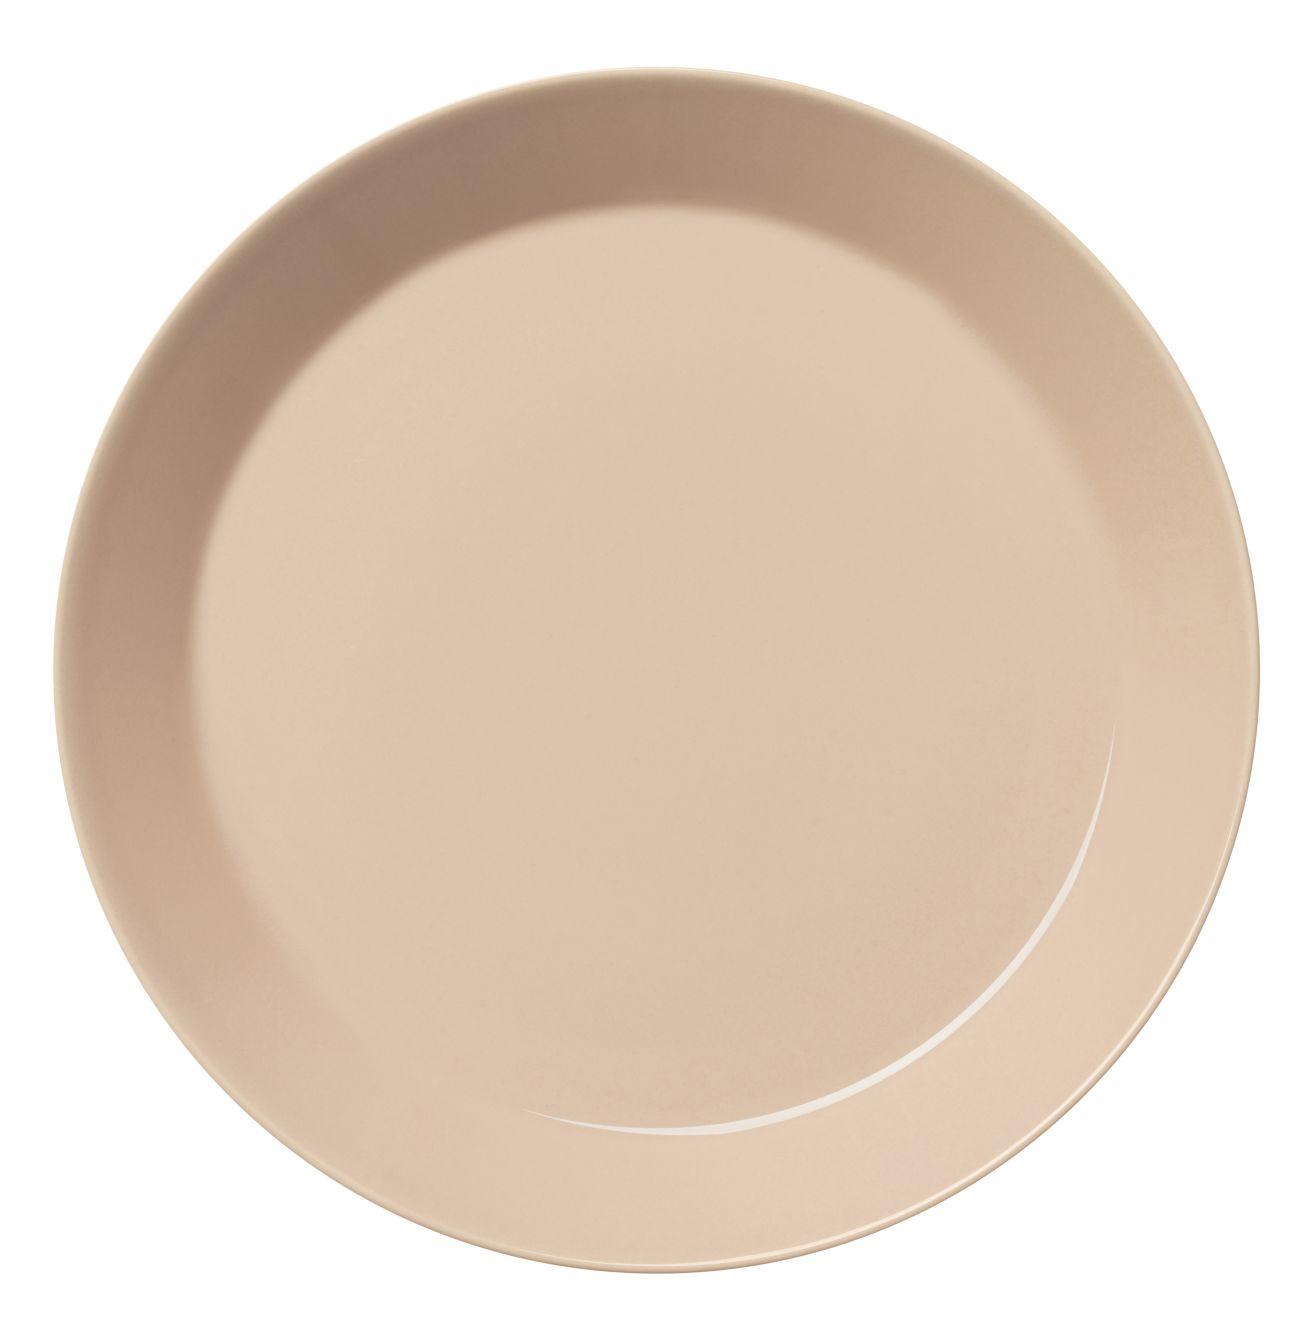 Teema_plate_26cm_powder_6411923662376.jpg